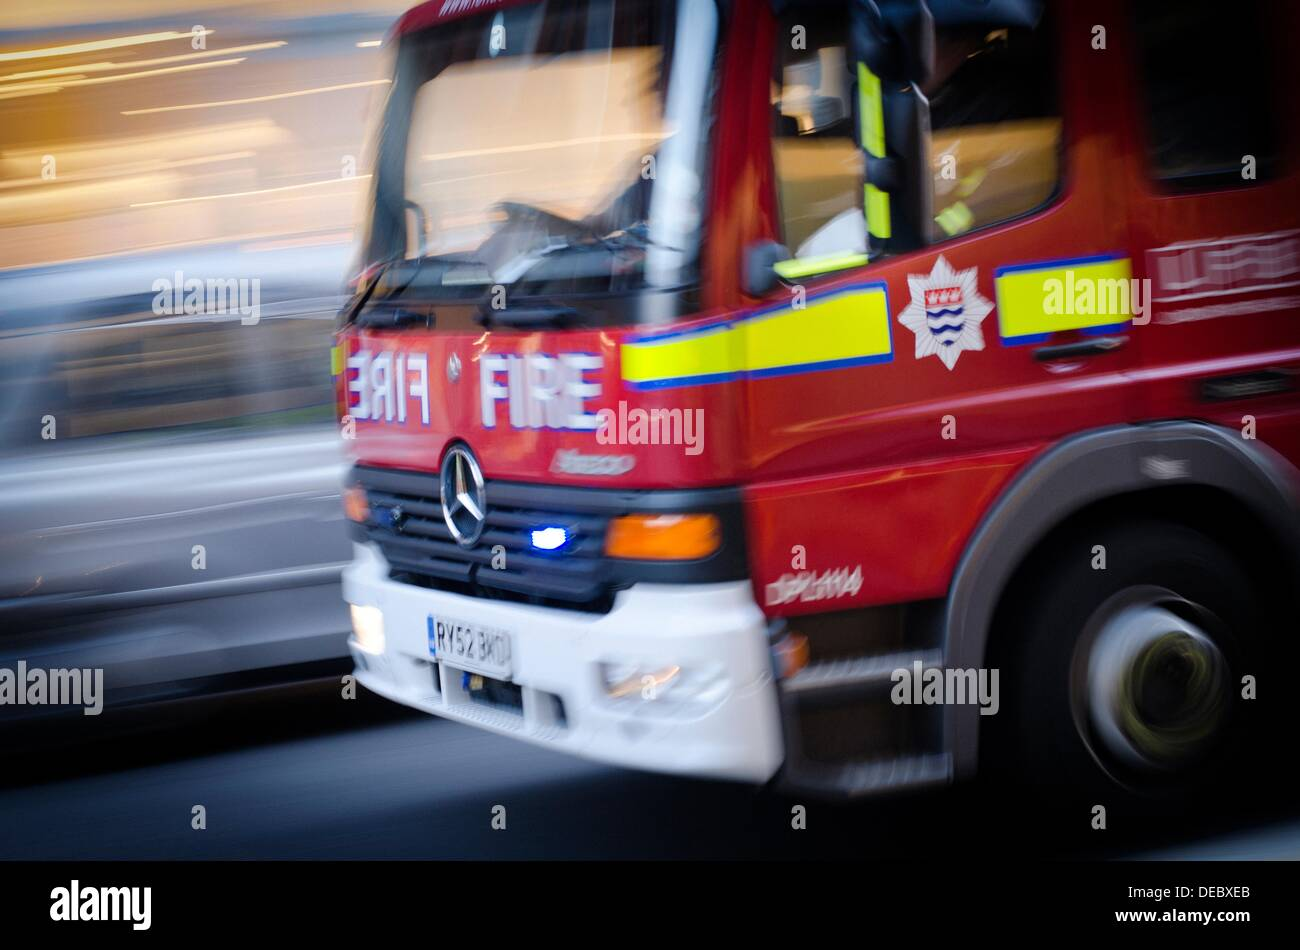 London Fire Brigade, Fire truck, London, England, Uk - Stock Image